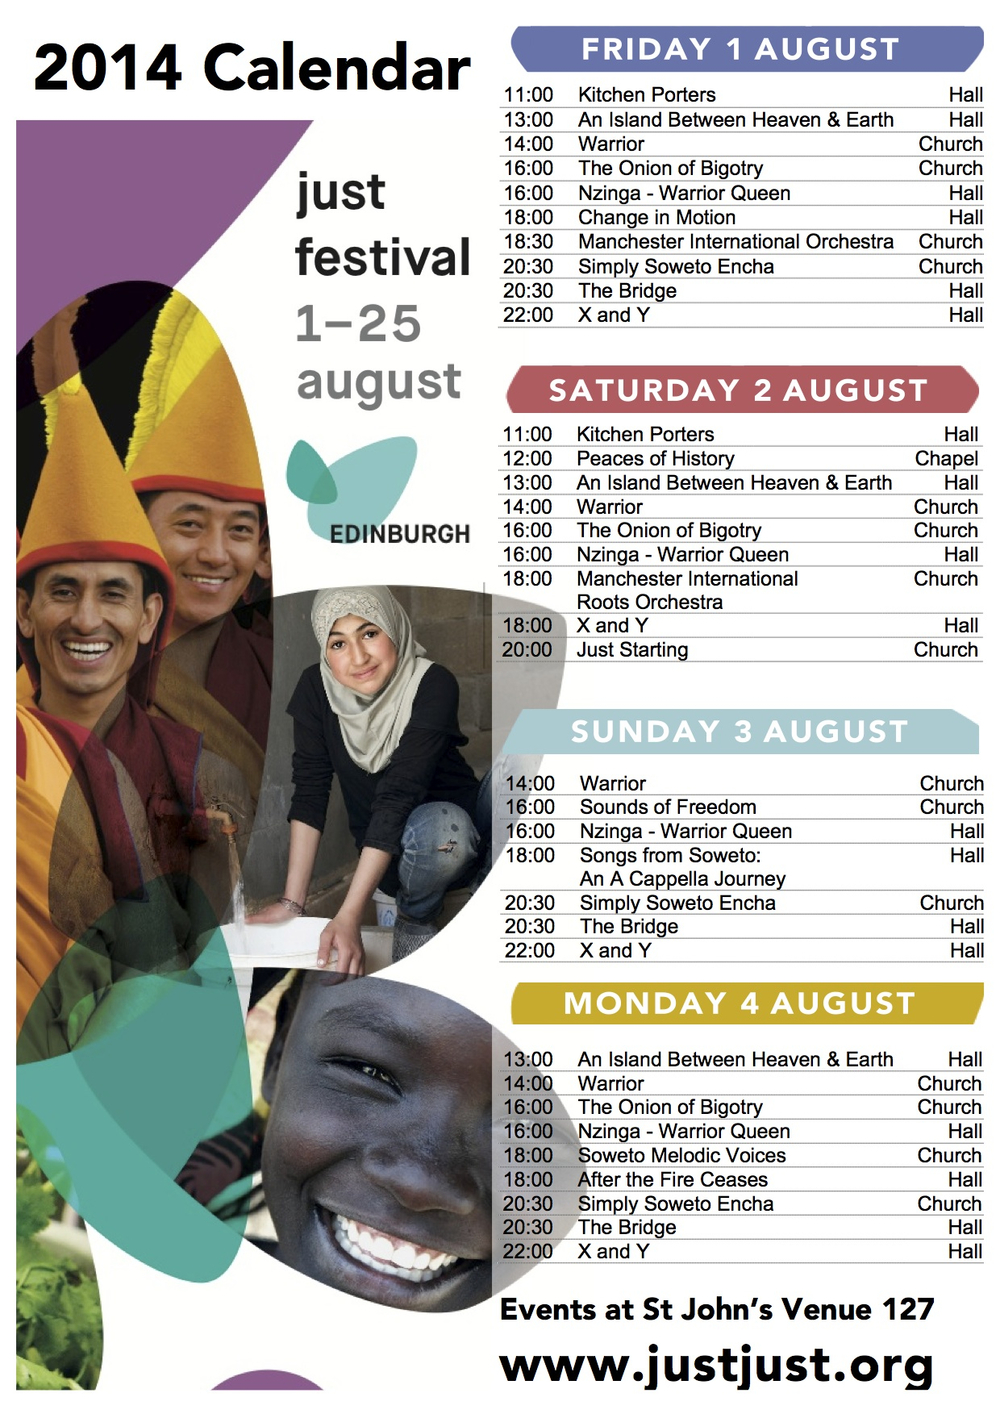 2014 Event Calendar 1st Page.jpg